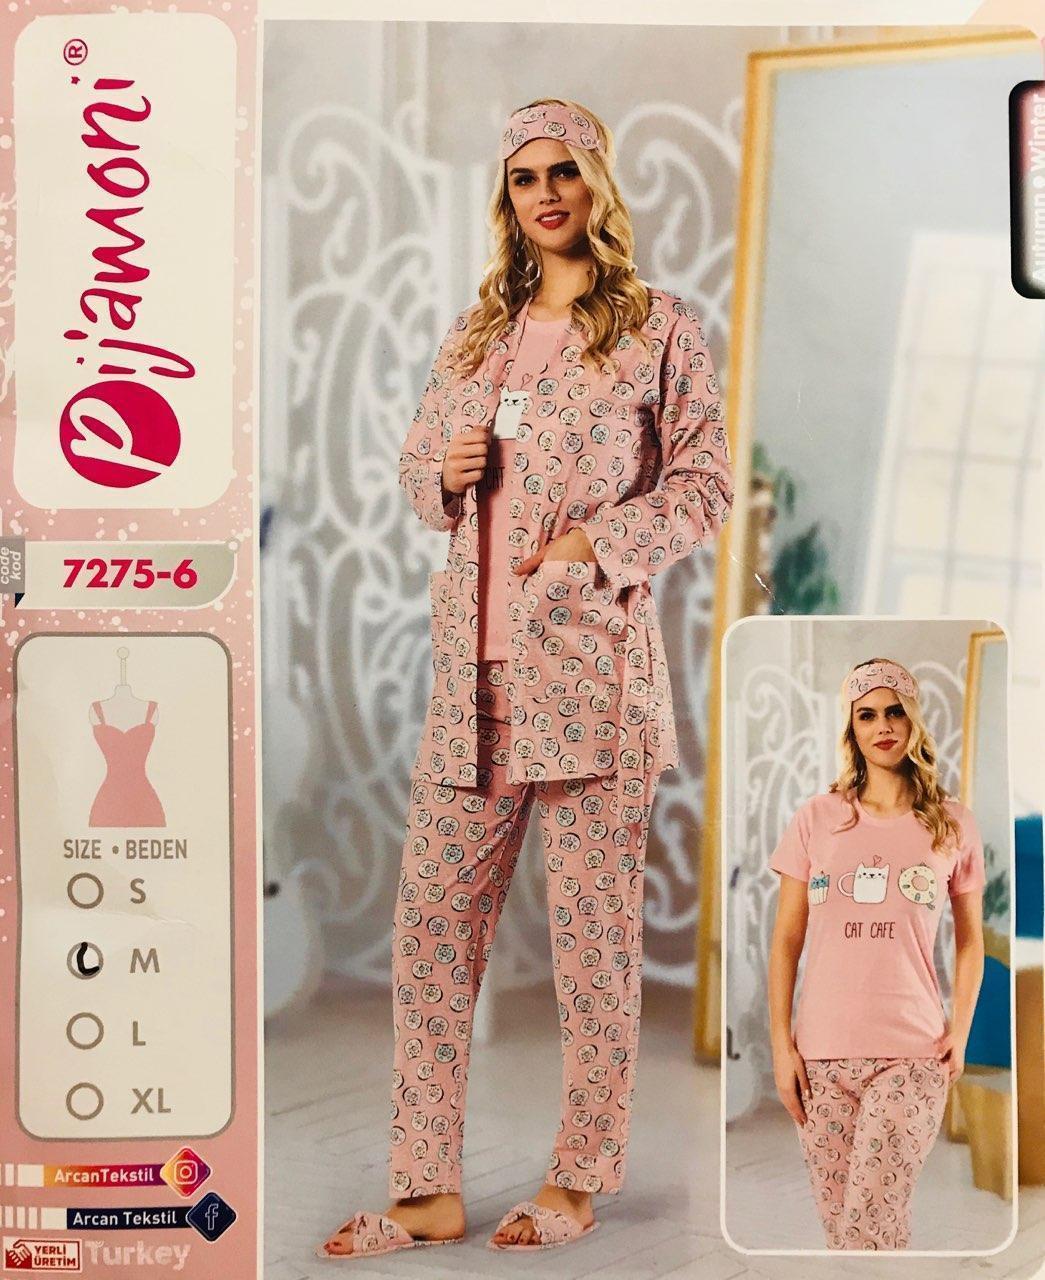 Женская пижама хлопок PIJAMONI Турция размер XL(50) + тапочки 7275-6